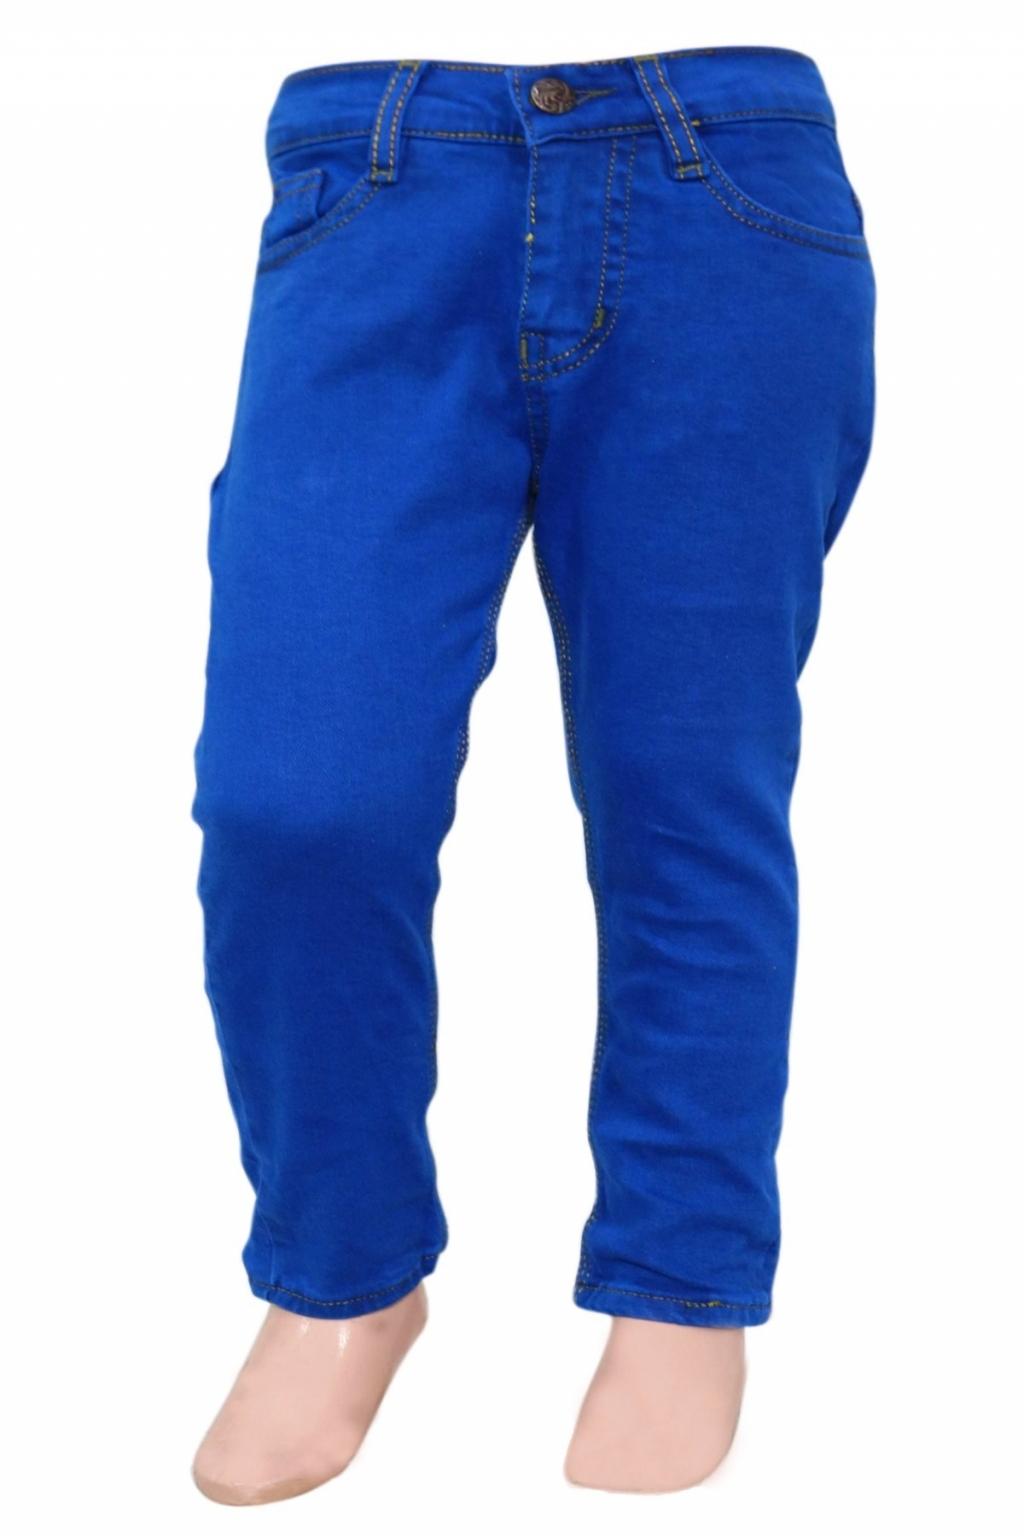 16262667950_Bindas_Collection_Basic_Denim_Jeans_Pant_For_Kidsv.jpg